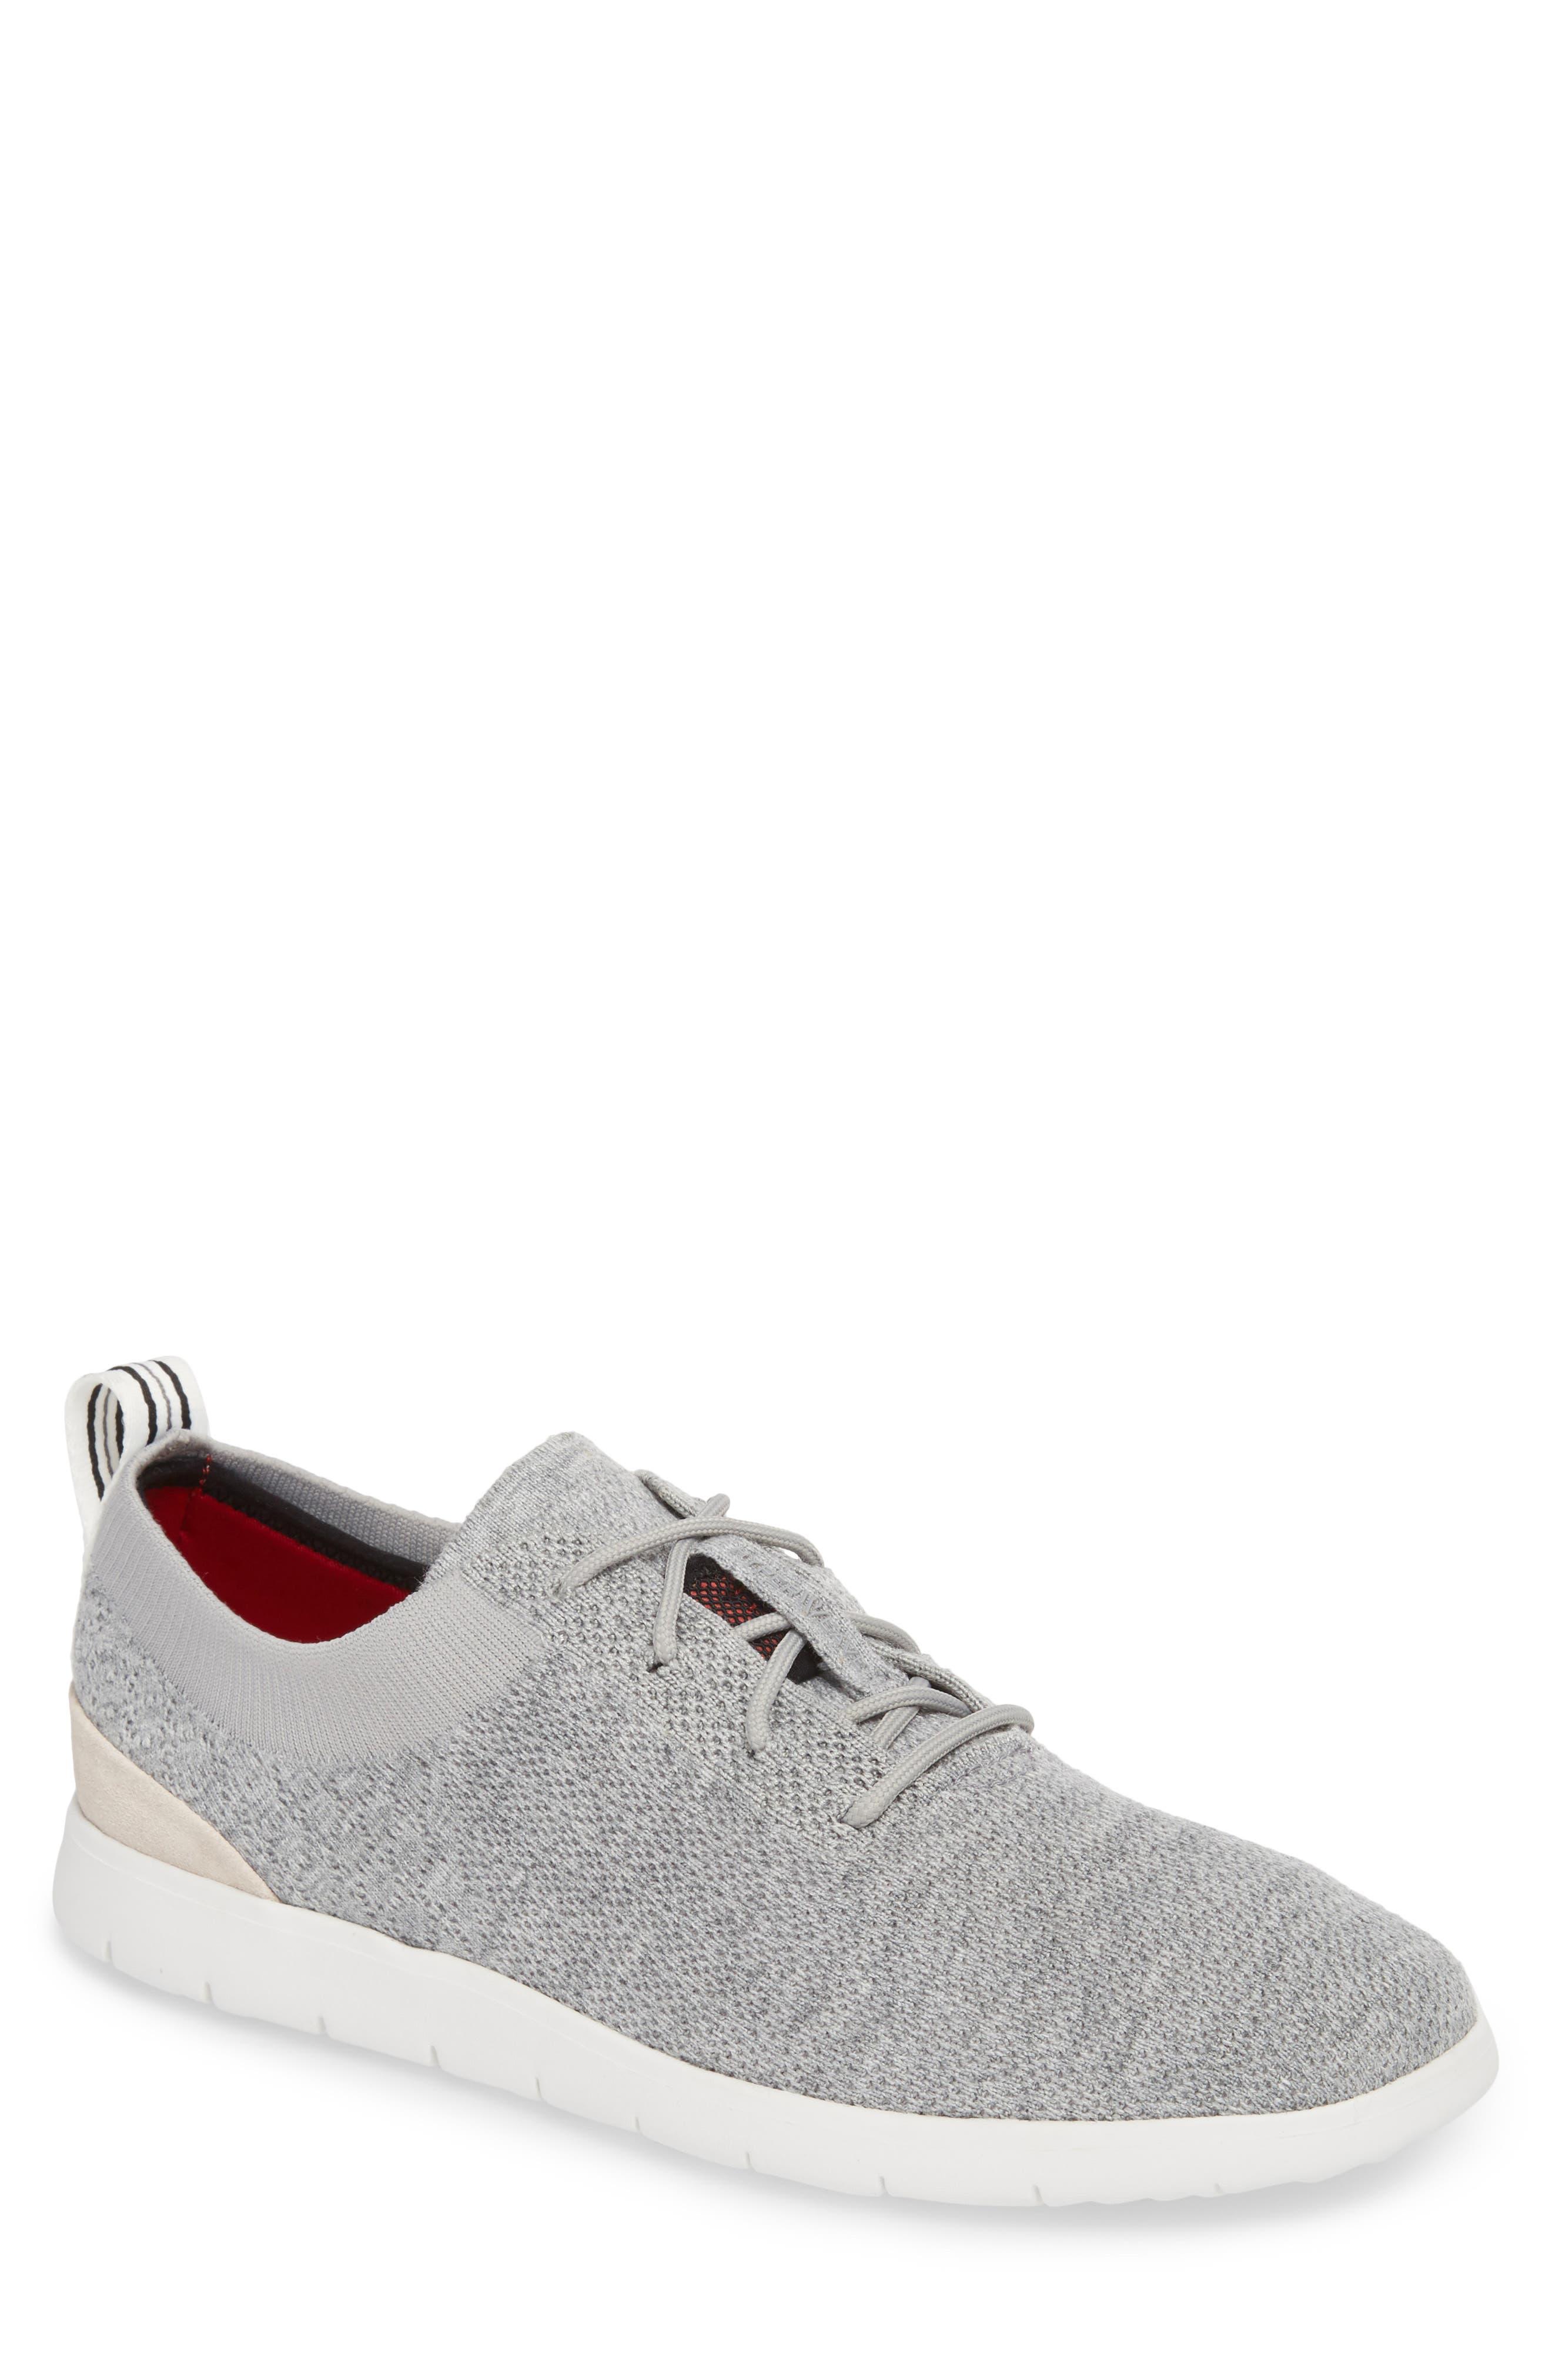 Feli HyperWeave Sneaker,                         Main,                         color, Seal Leather